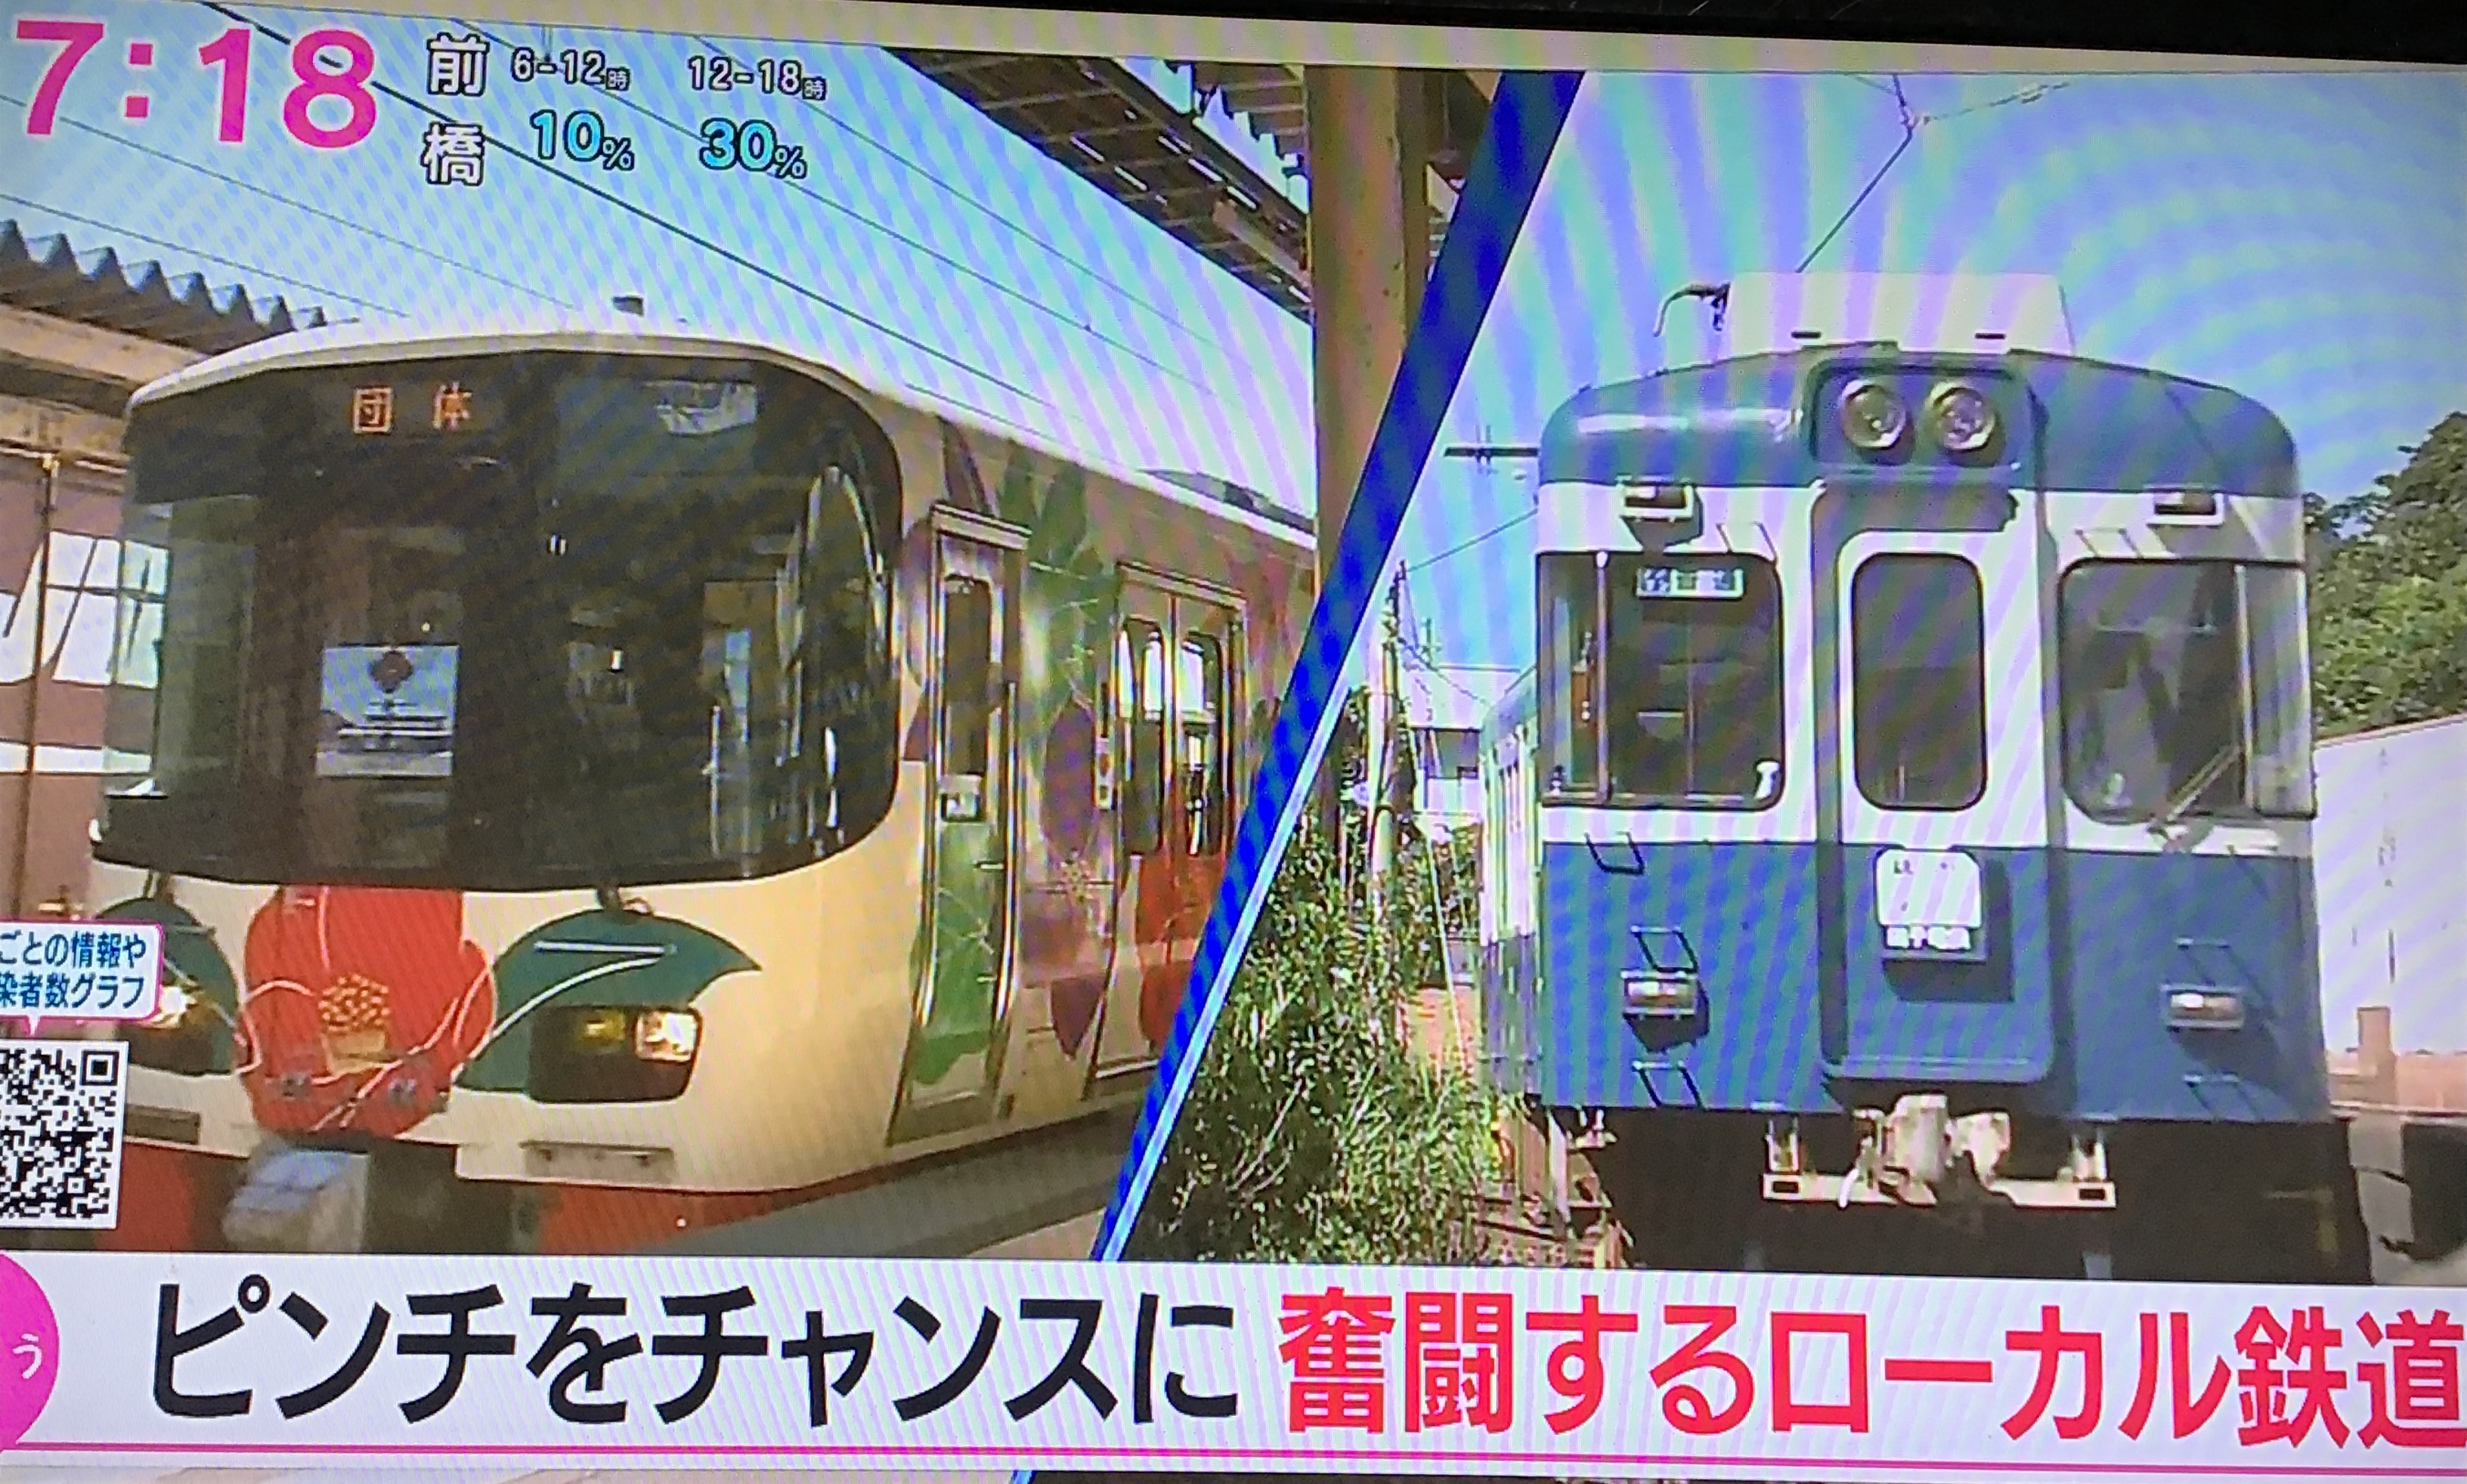 NHKおはよう日本、ご視聴ありがとうございました。